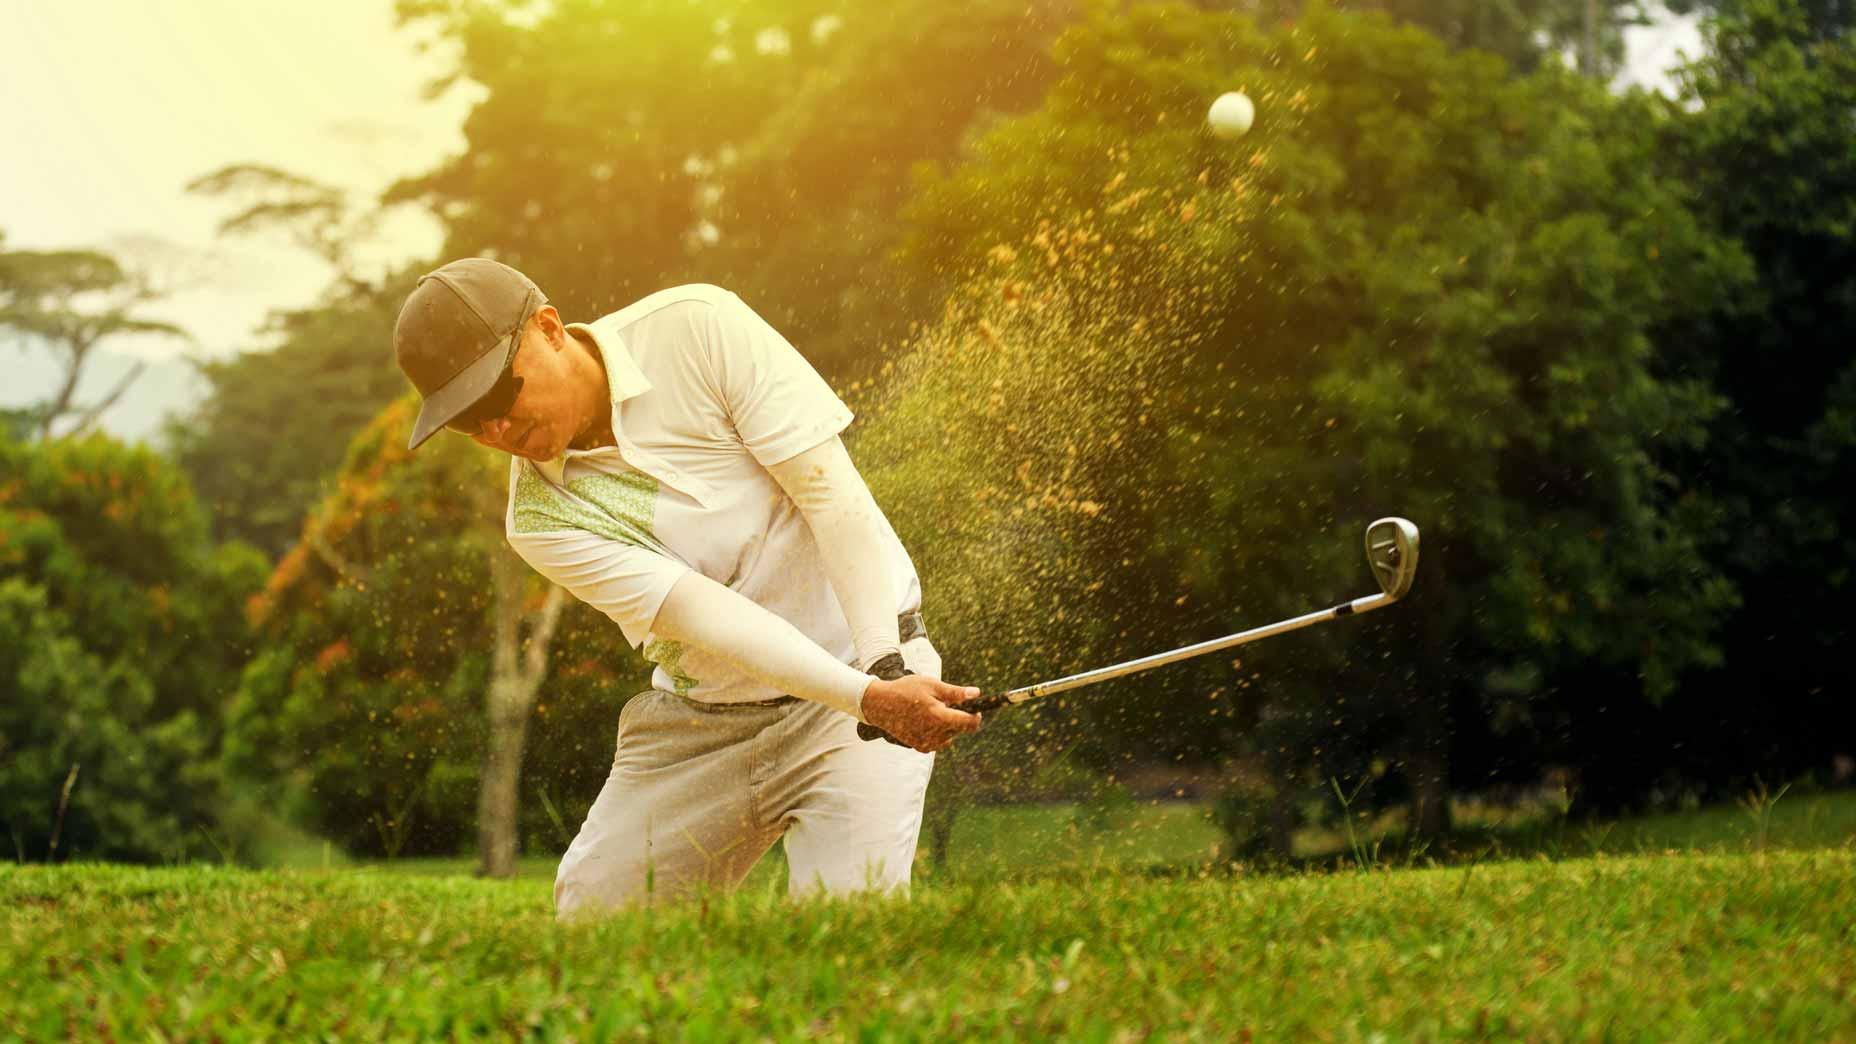 golfer hits bunker shot